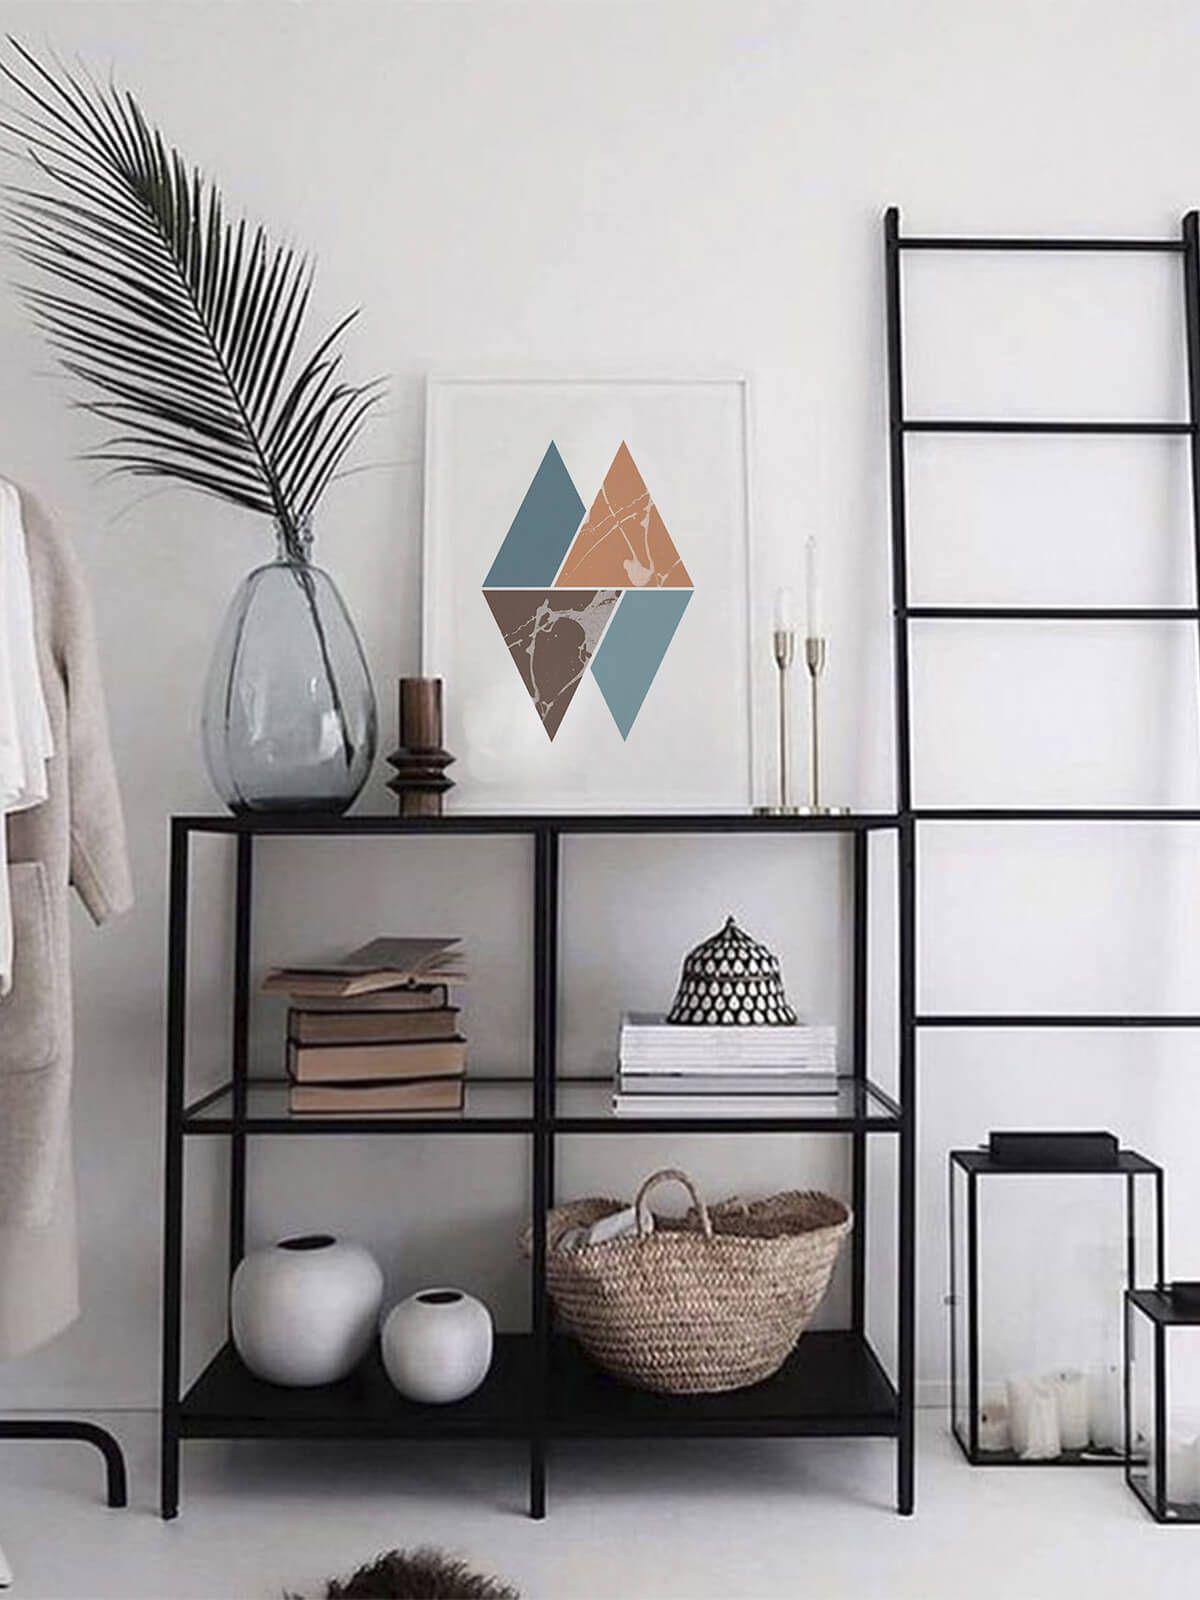 16 Stylish Scandinavian Living Room Ideas That Will Transform Your Space In 2020 Living Room Scandinavian Home Decor Living Room Decor